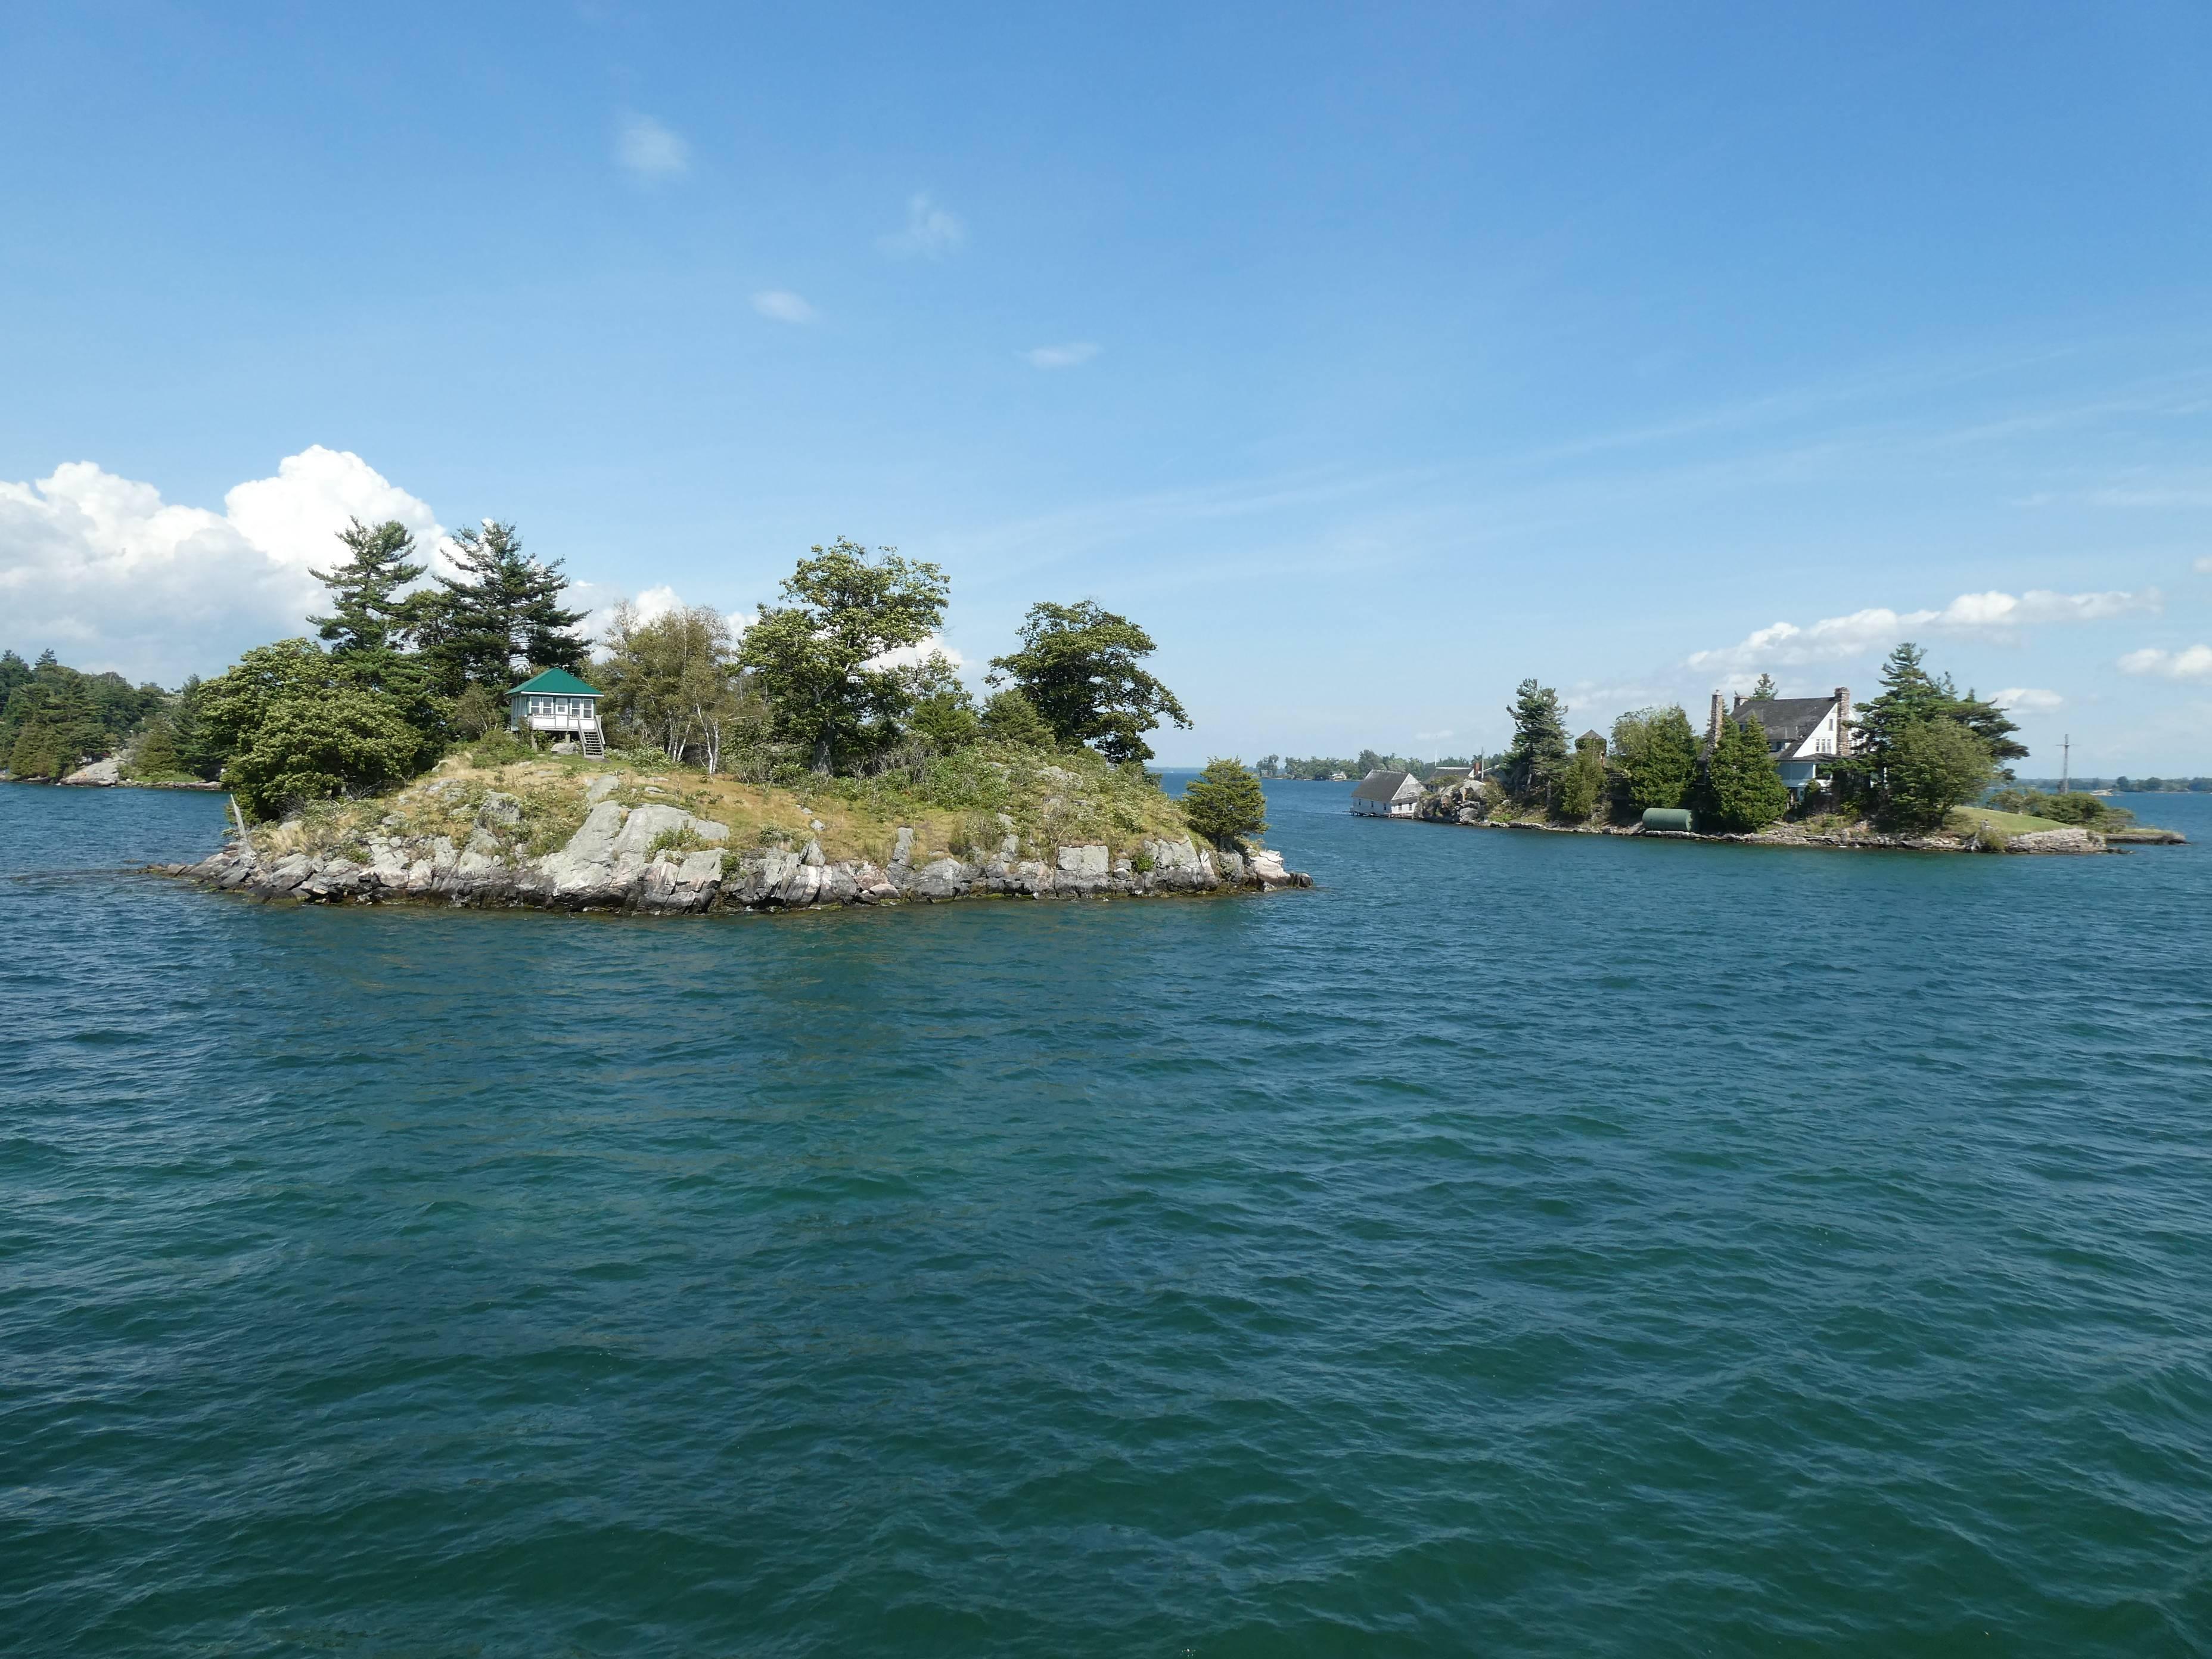 Photo 1: Croisière aux Mille-Iles, Ontario, Canada